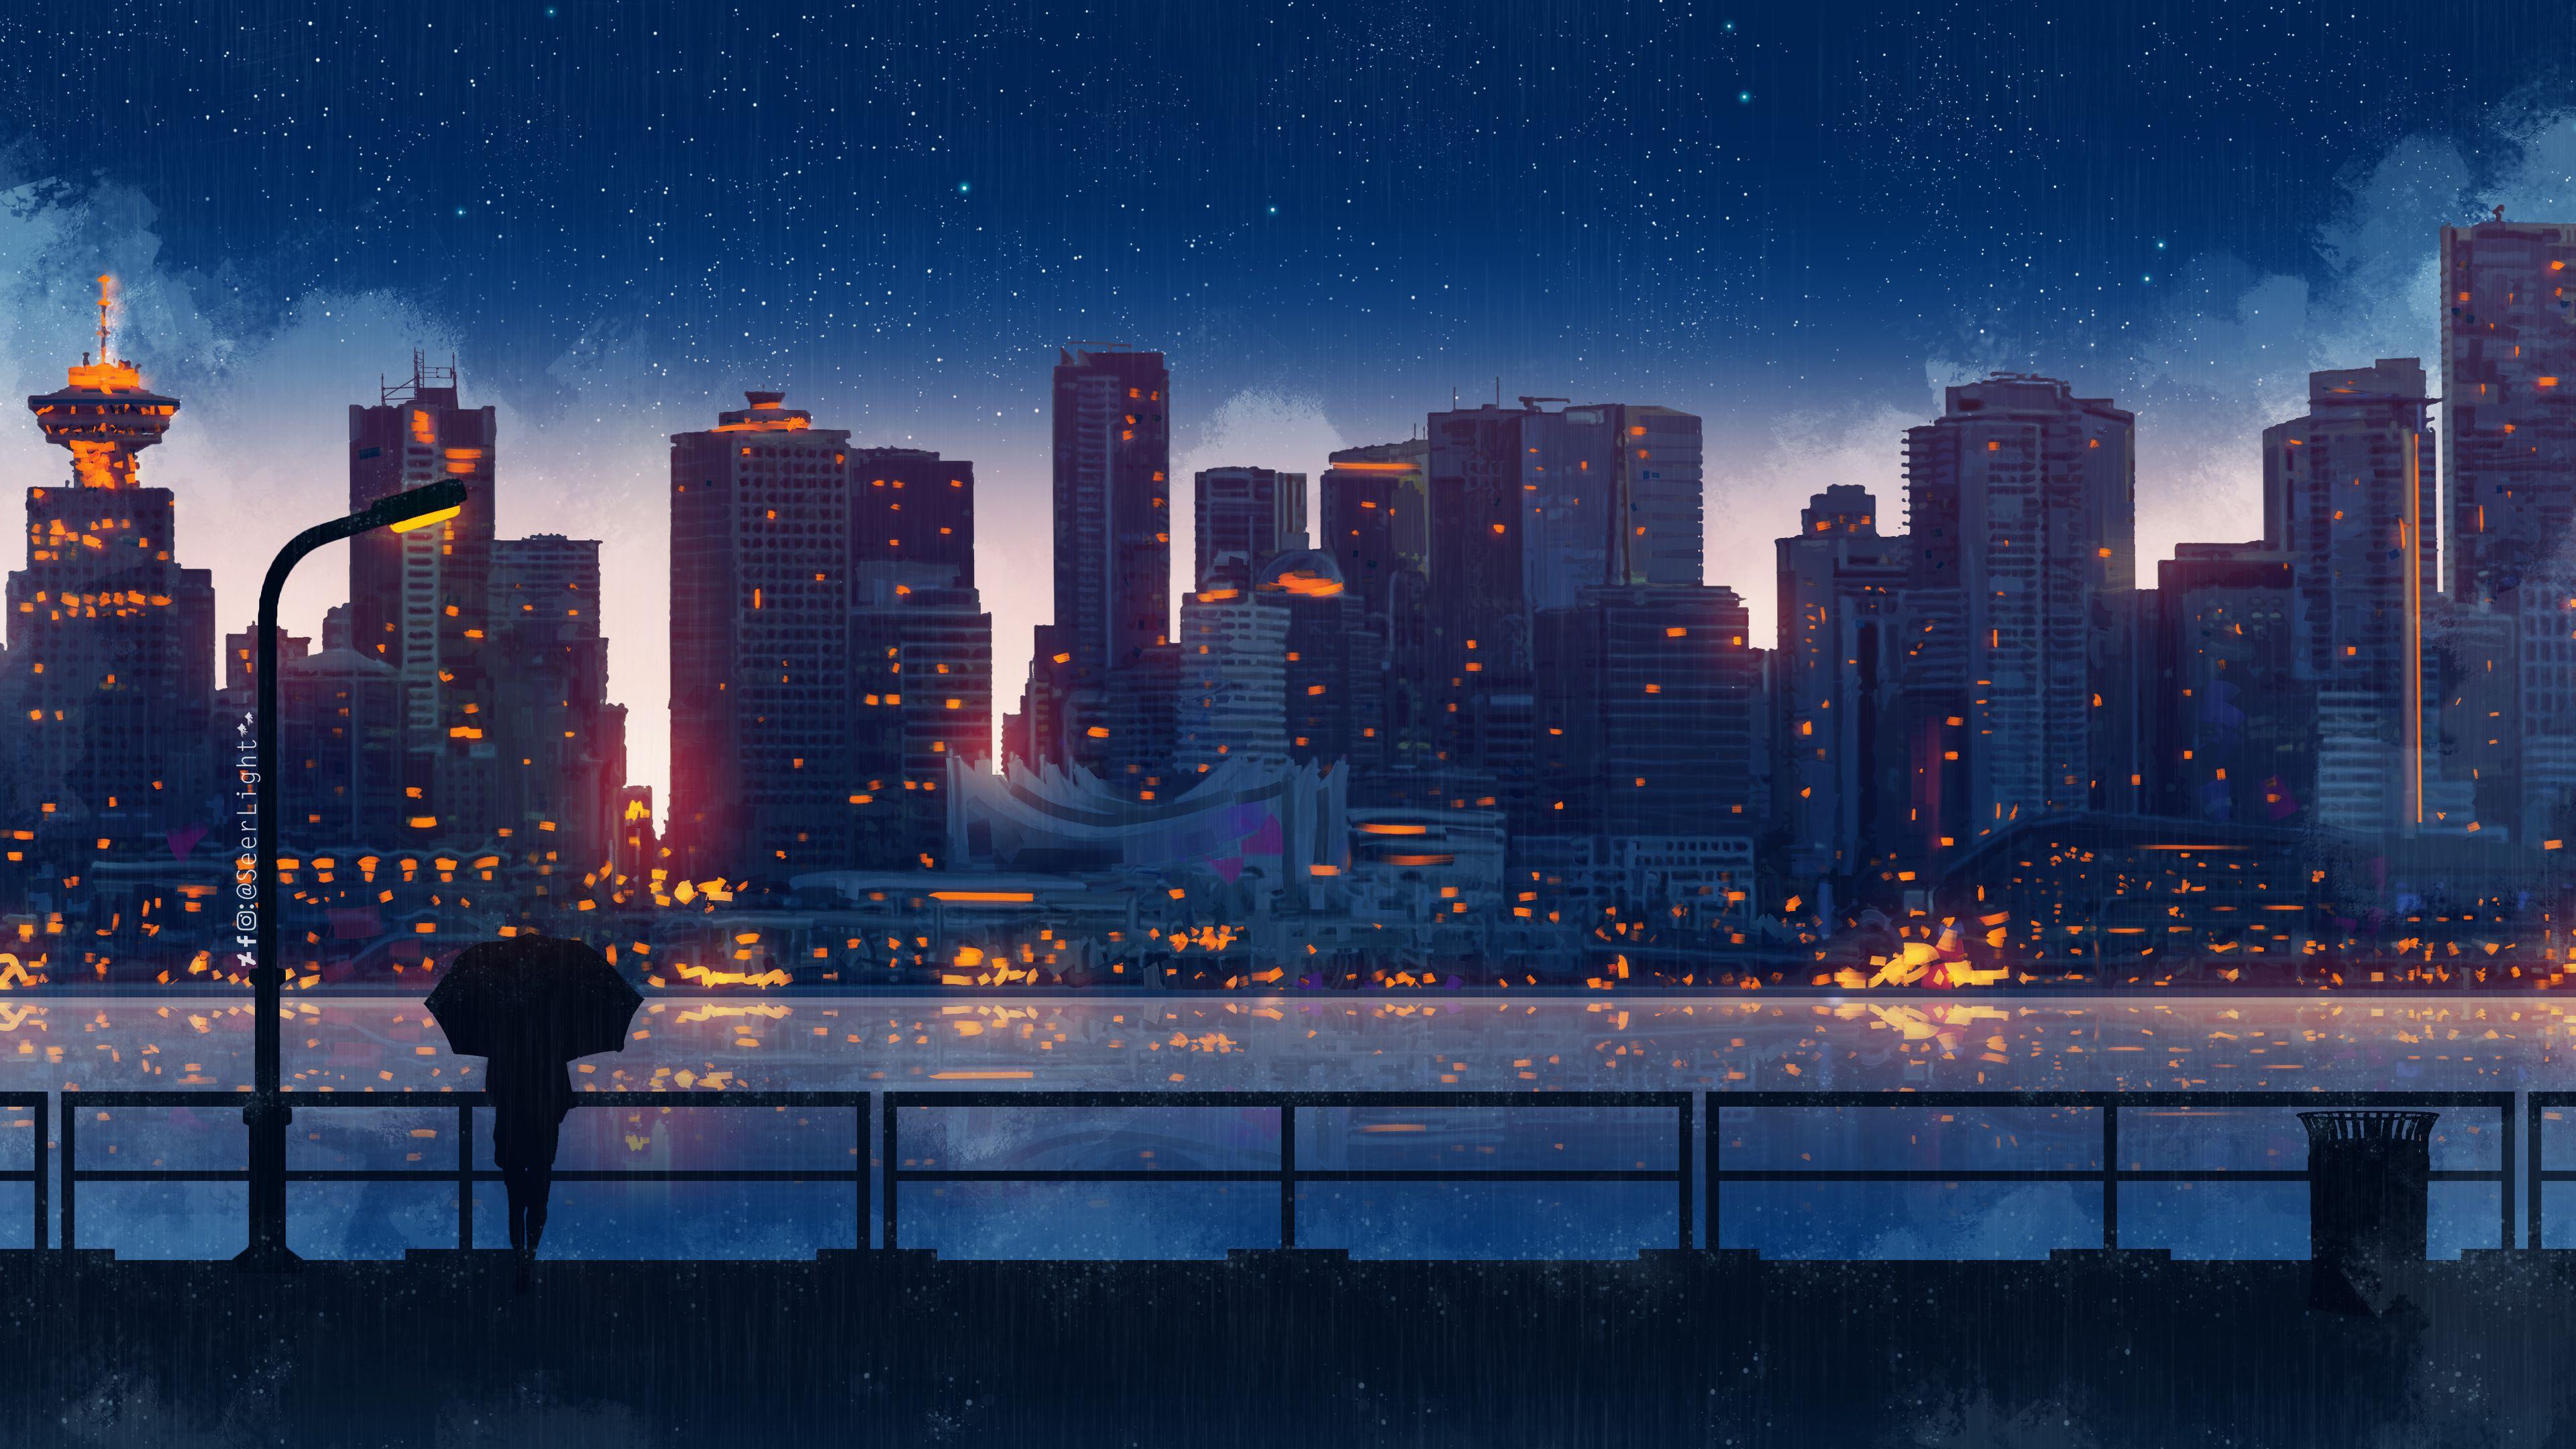 Anime City Lights Night Rain Umbrella Sky 4k Umbrella Wallpapers Hd Wallpapers Digital Art Wallpapers De In 2020 Anime Scenery Wallpaper Anime City Scenic Wallpaper